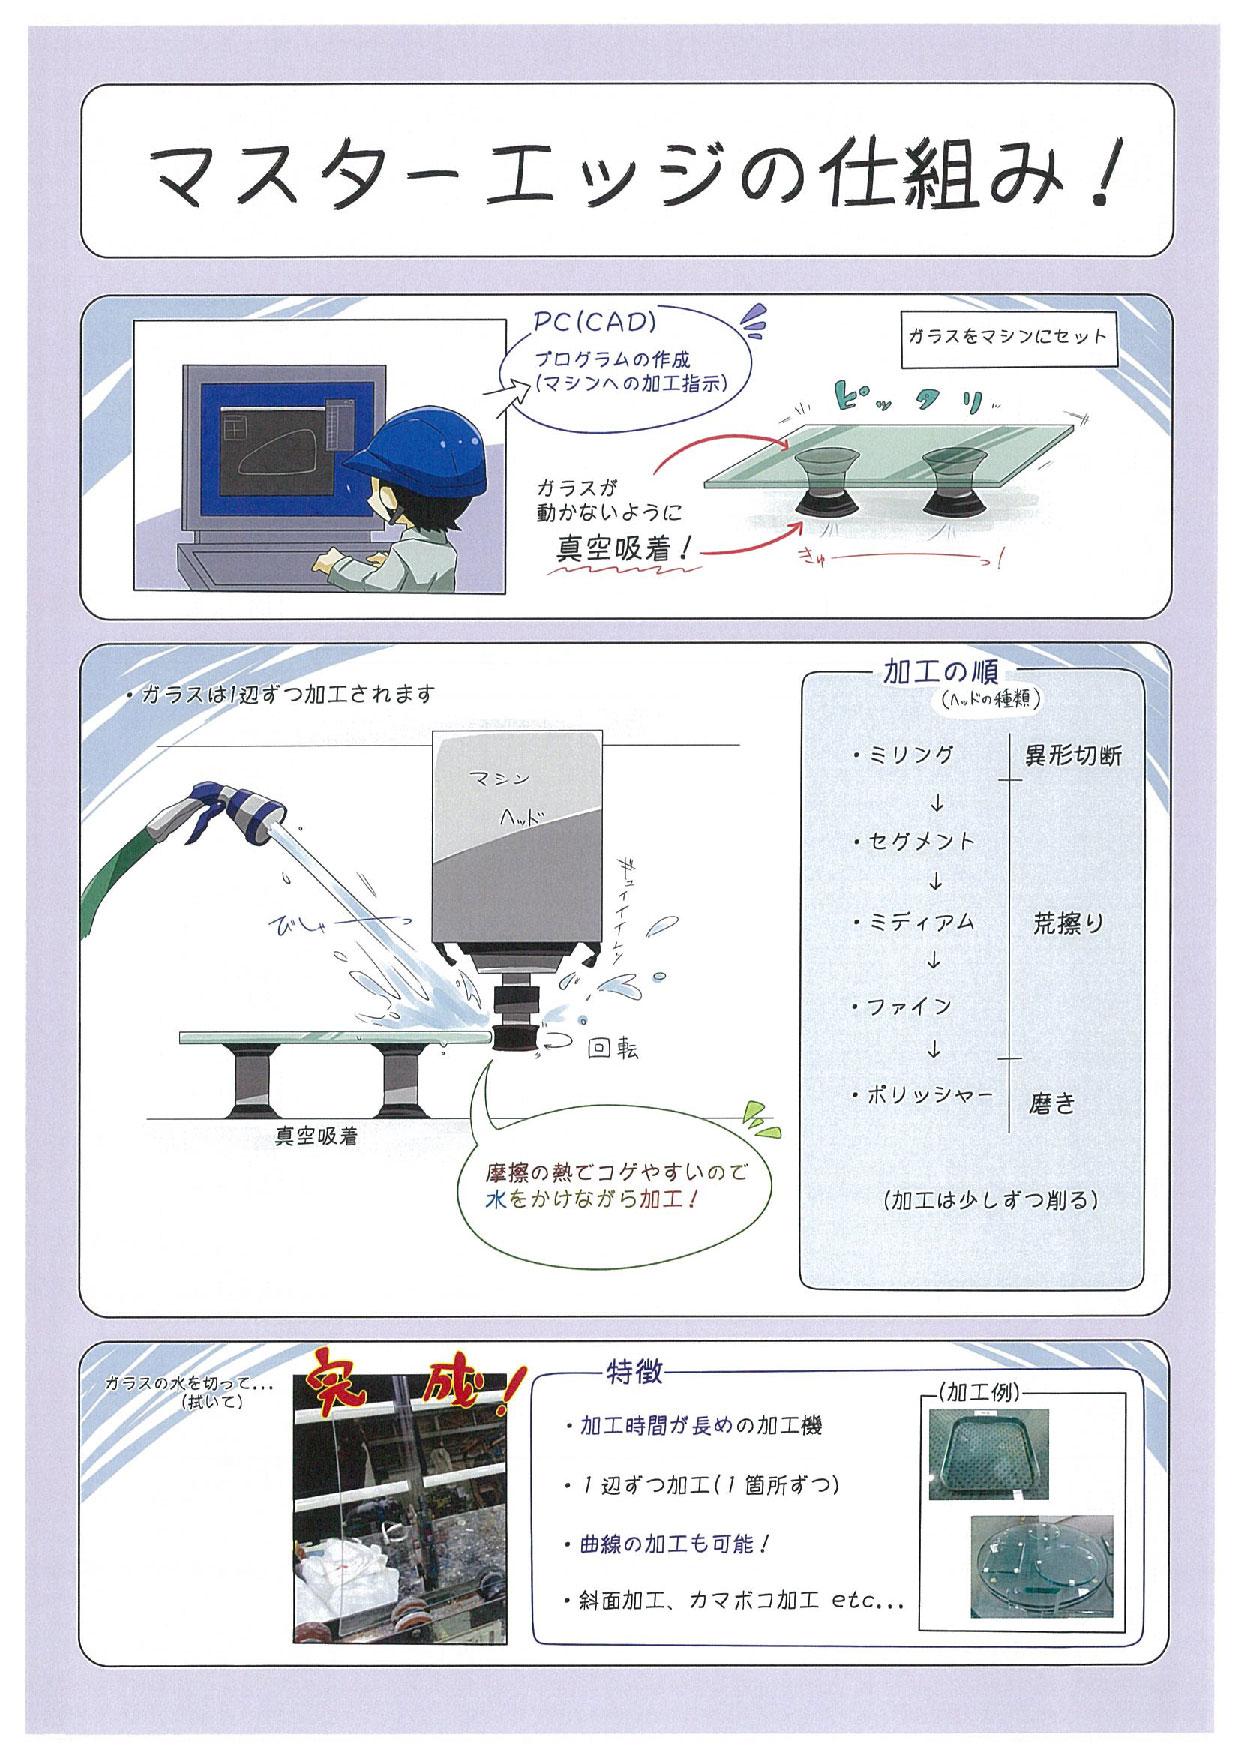 https://www.sanshiba-g.co.jp/images/setubi/ME.jpg